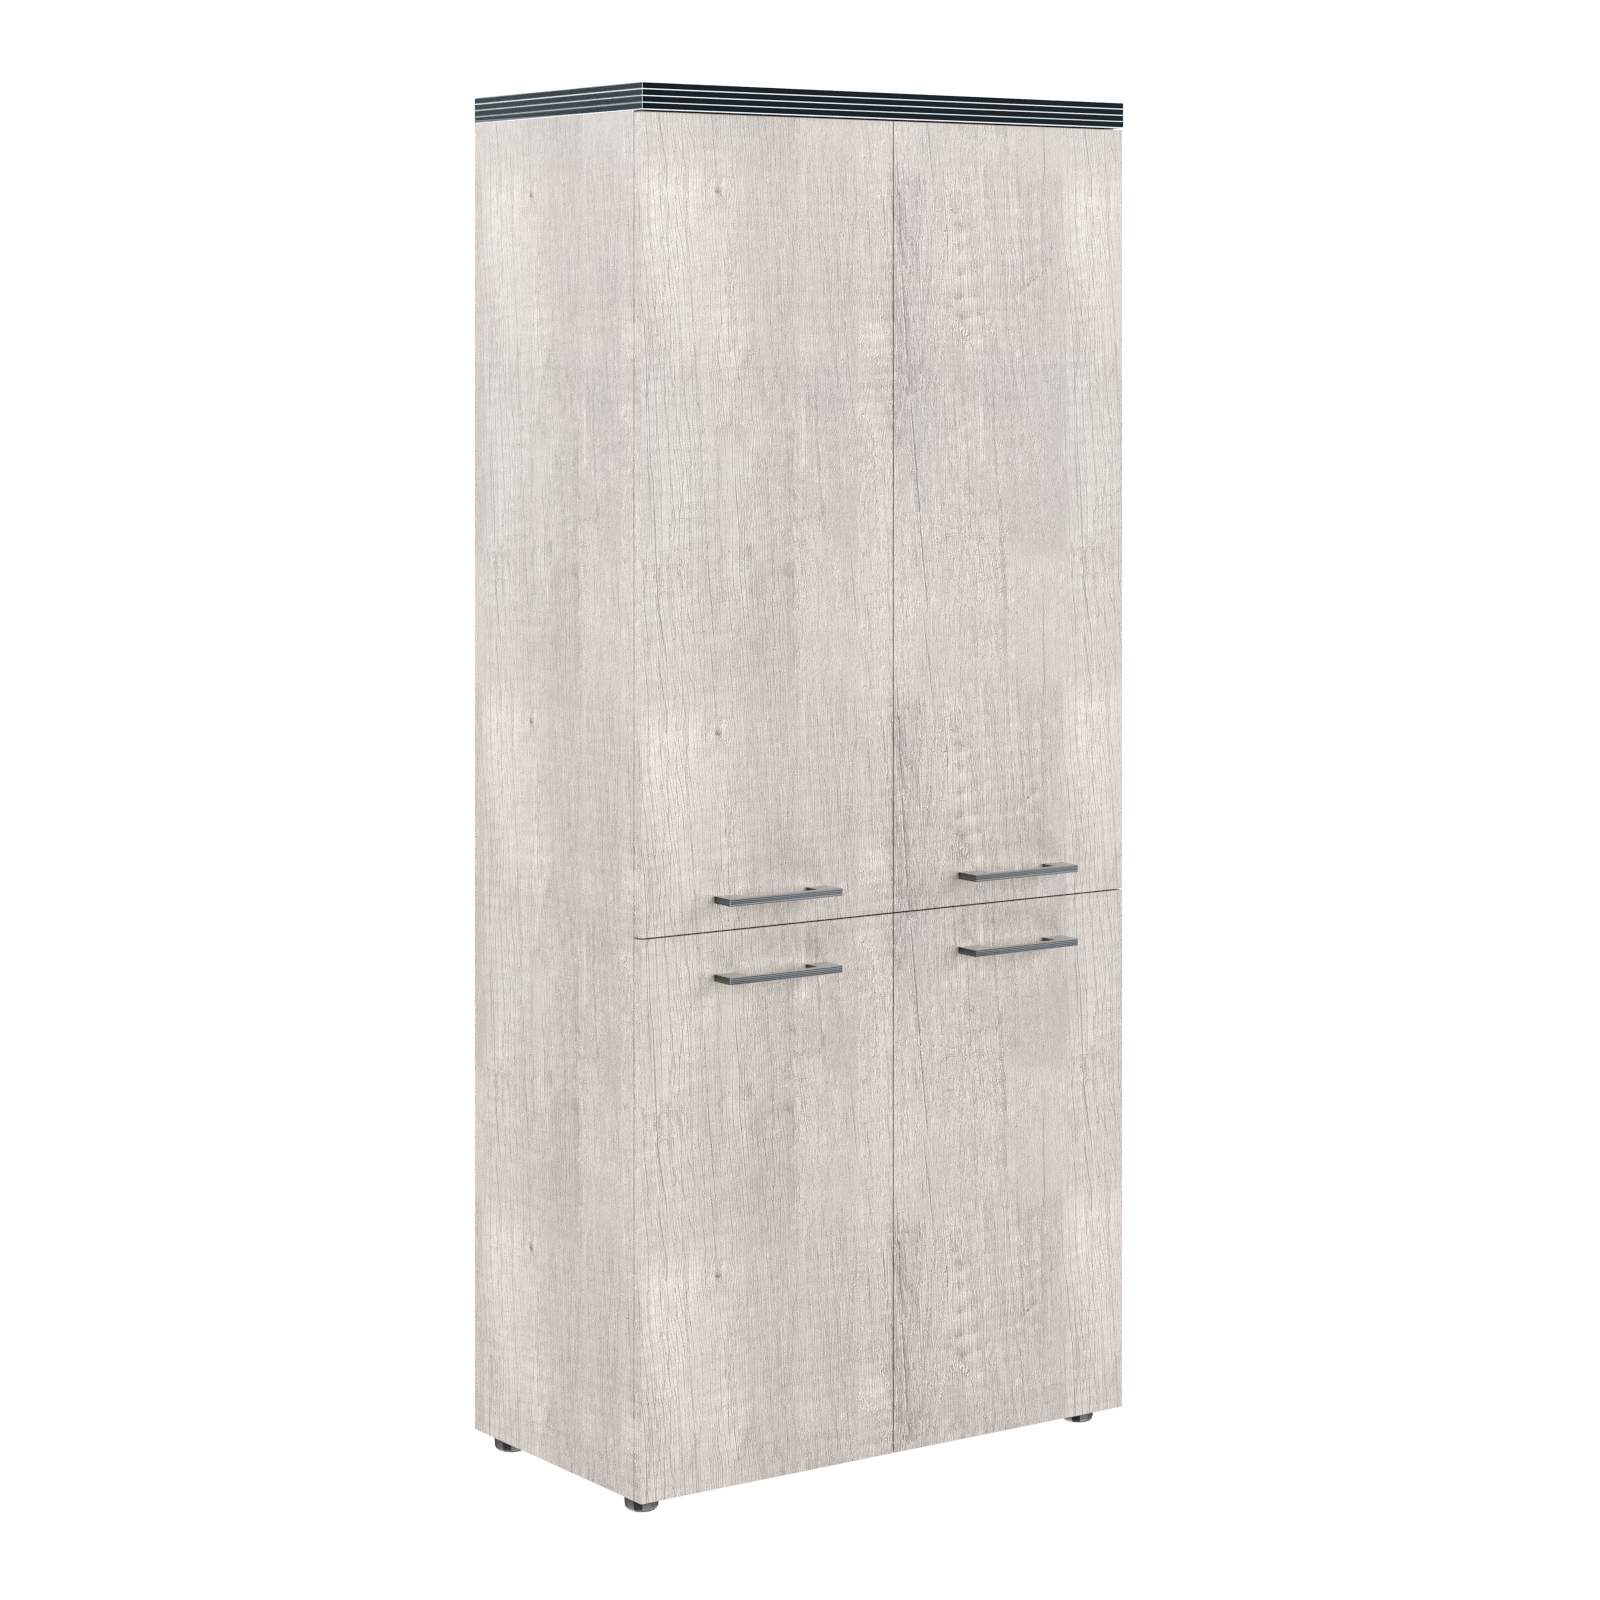 Шкаф с 4мя дверями 850x430x1930